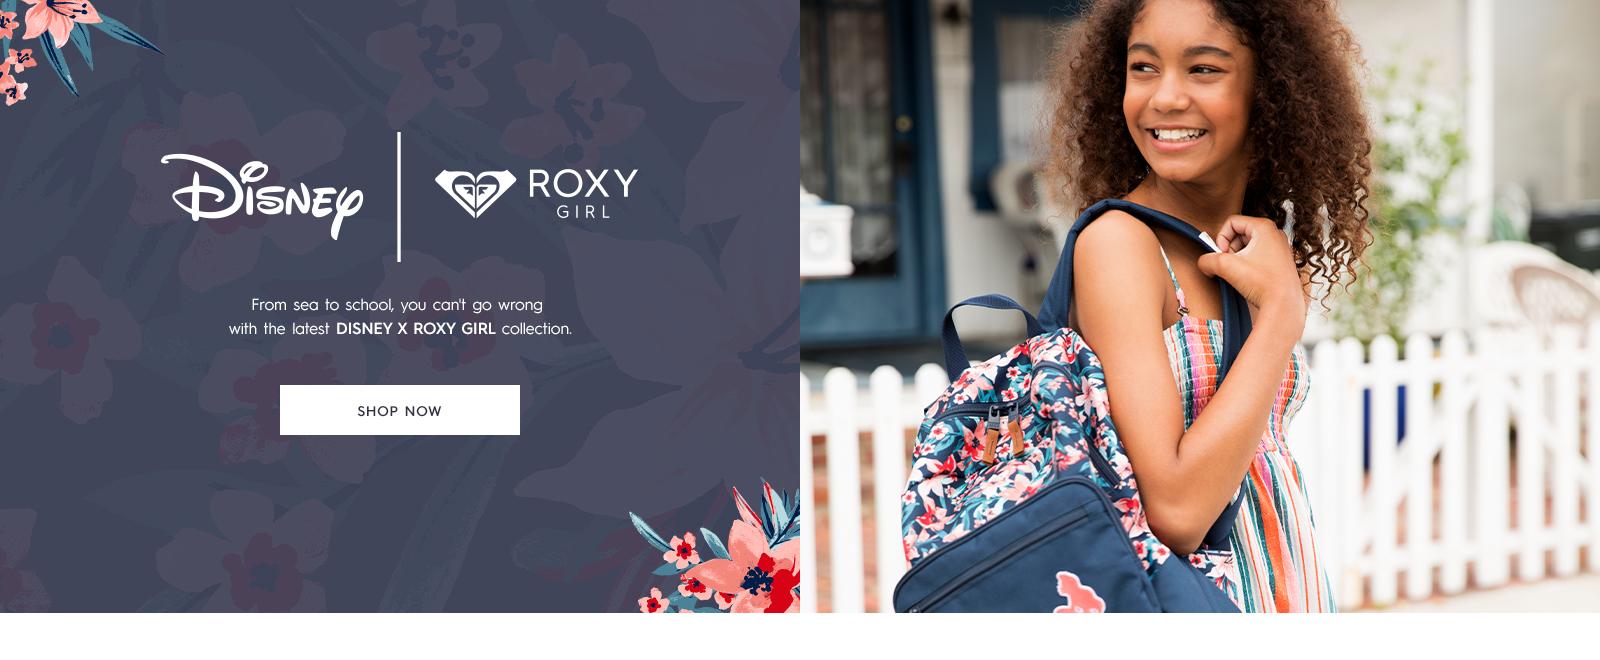 b1e96657a9 Roxy | Surf, Snowboard & Fitness Brand - Women's Lifestyle